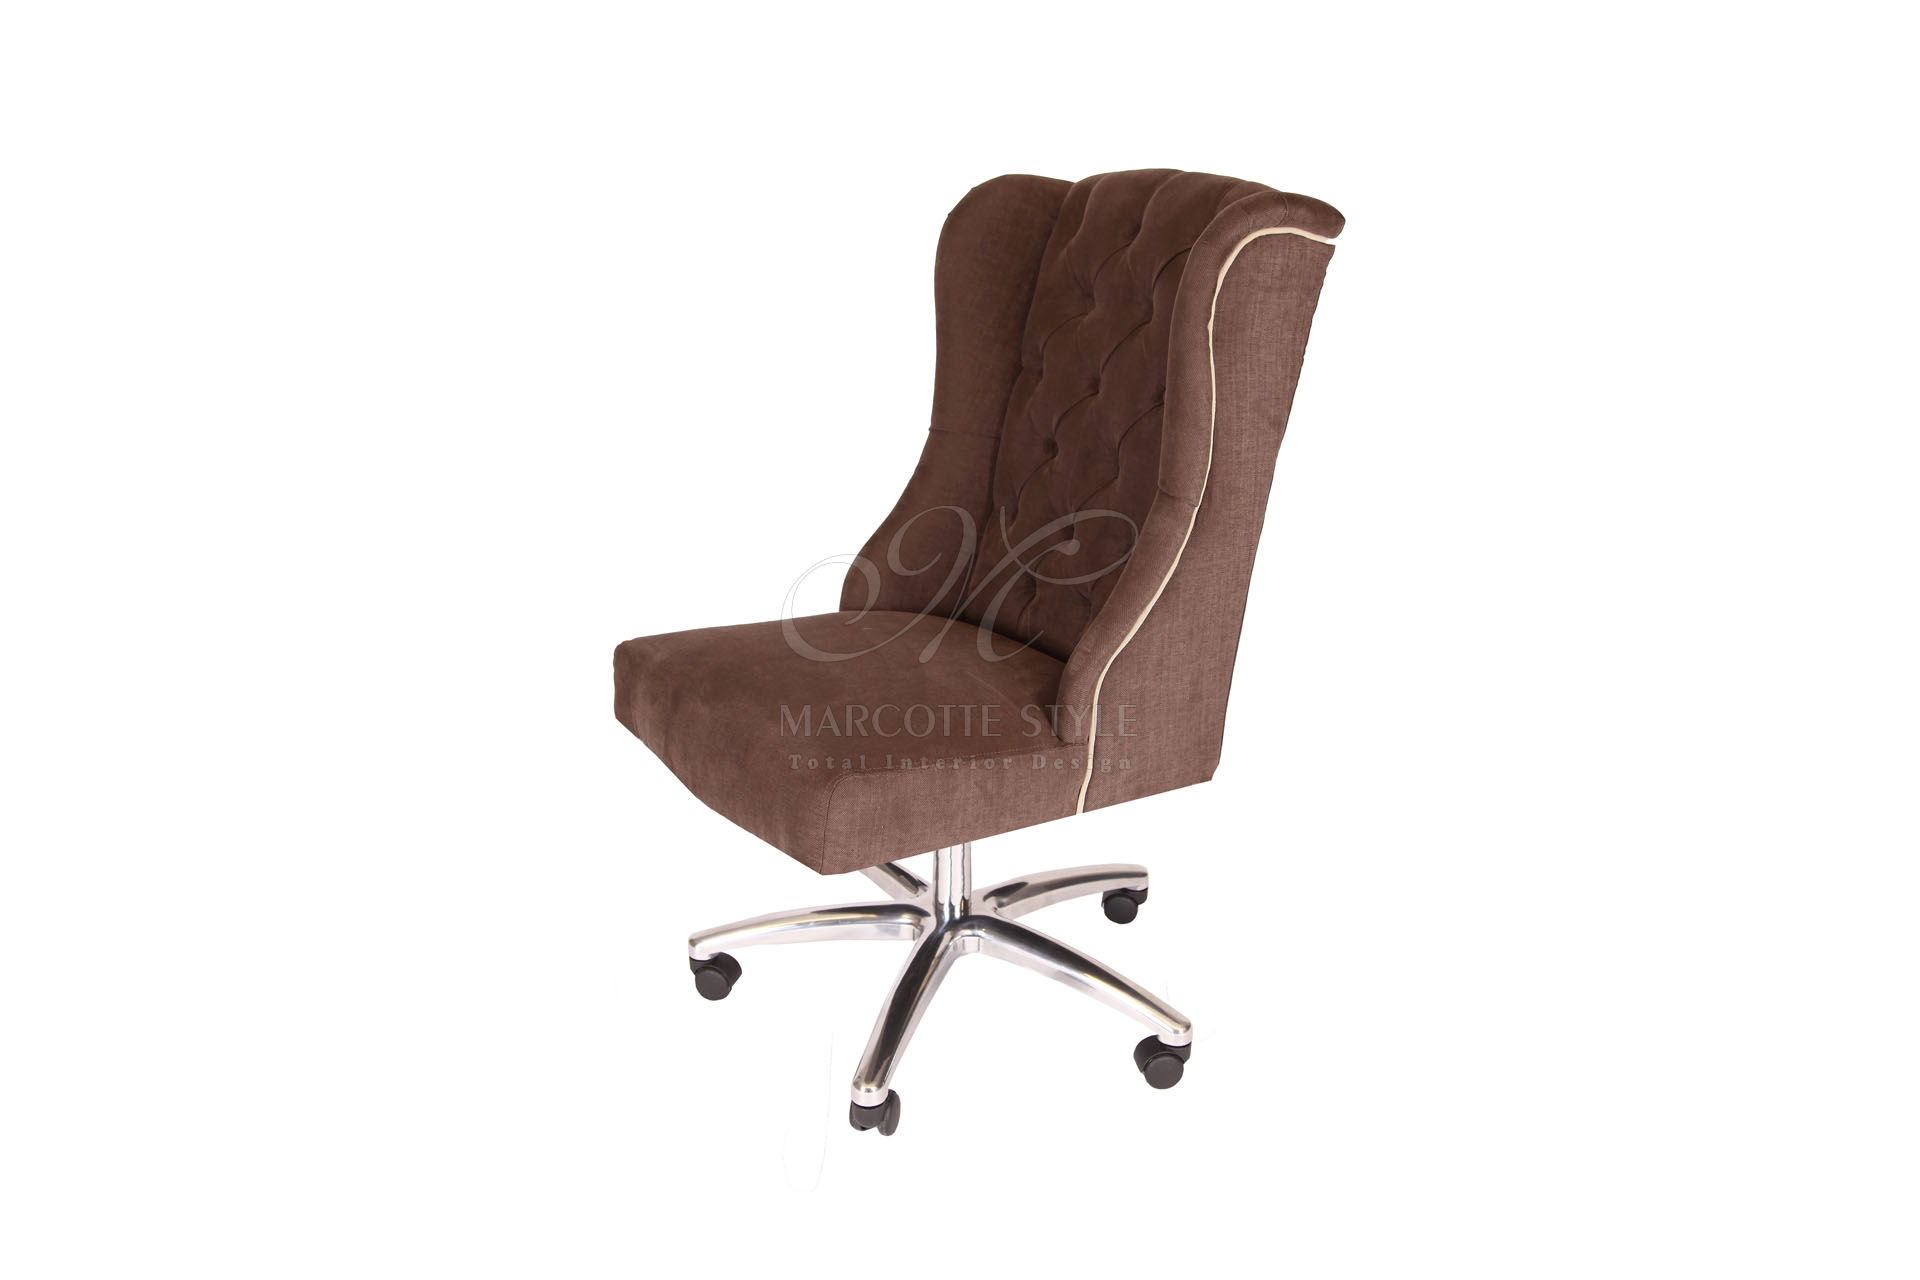 Marcottestyle dimitri officechair bureau stoel.3 marcotte style